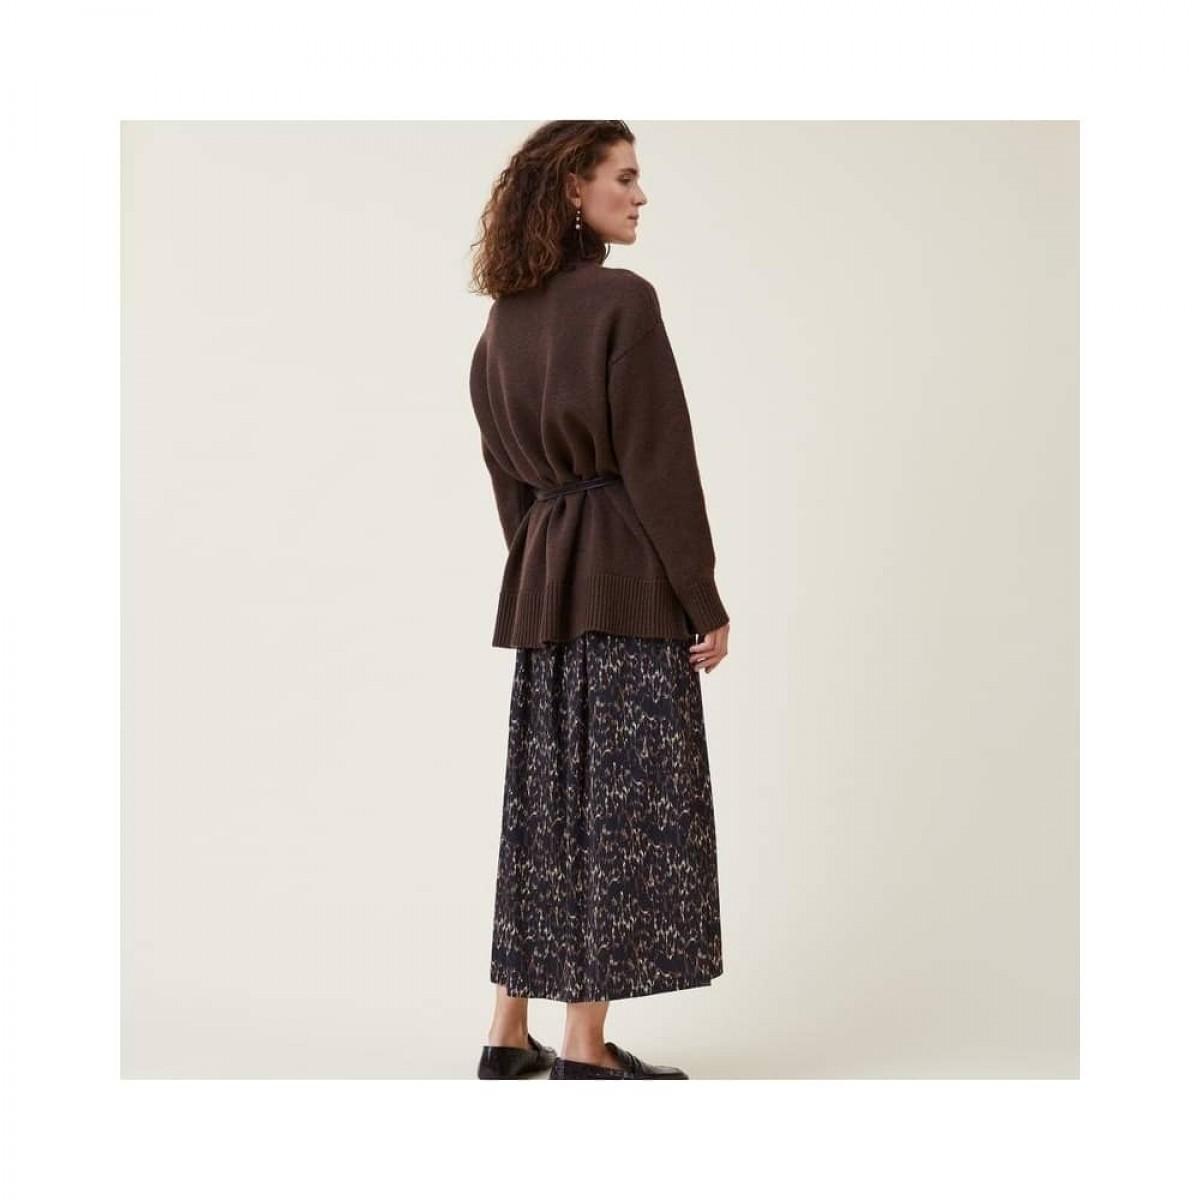 manny pullover - dark brown - model fra siden